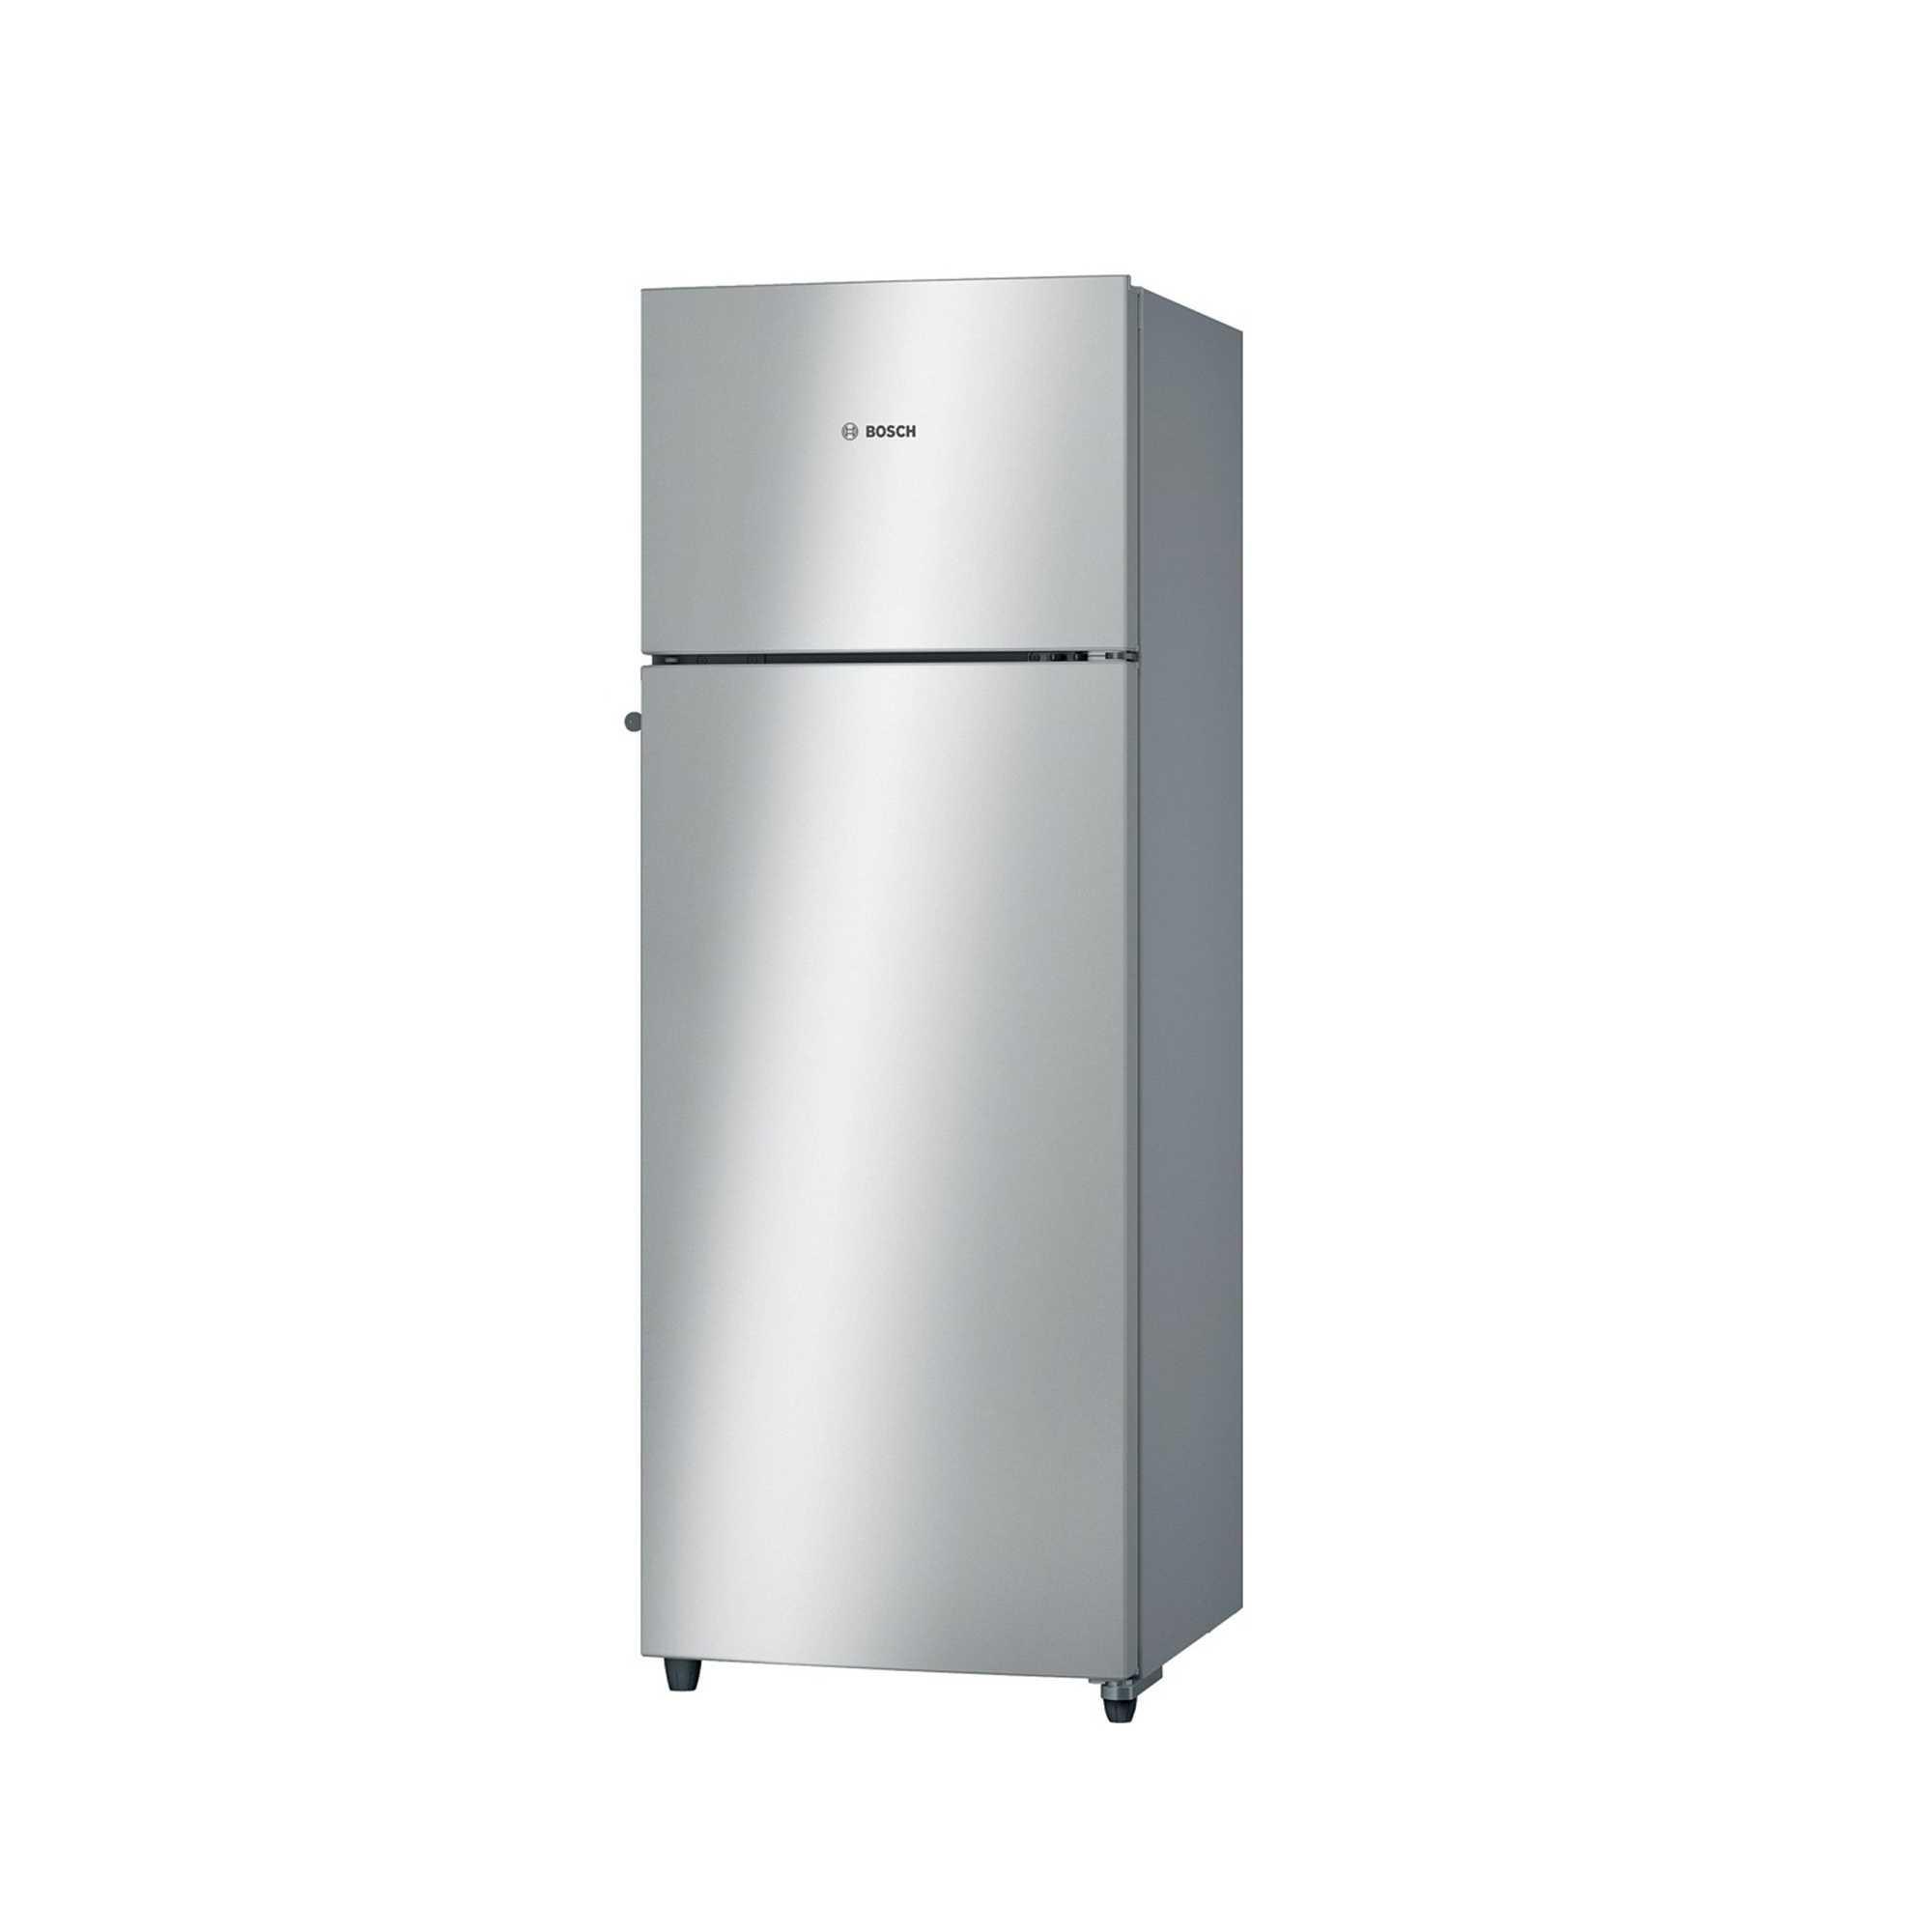 Bosch KDN30VS20I Double Door 290 Litres Frost Free Refrigerator